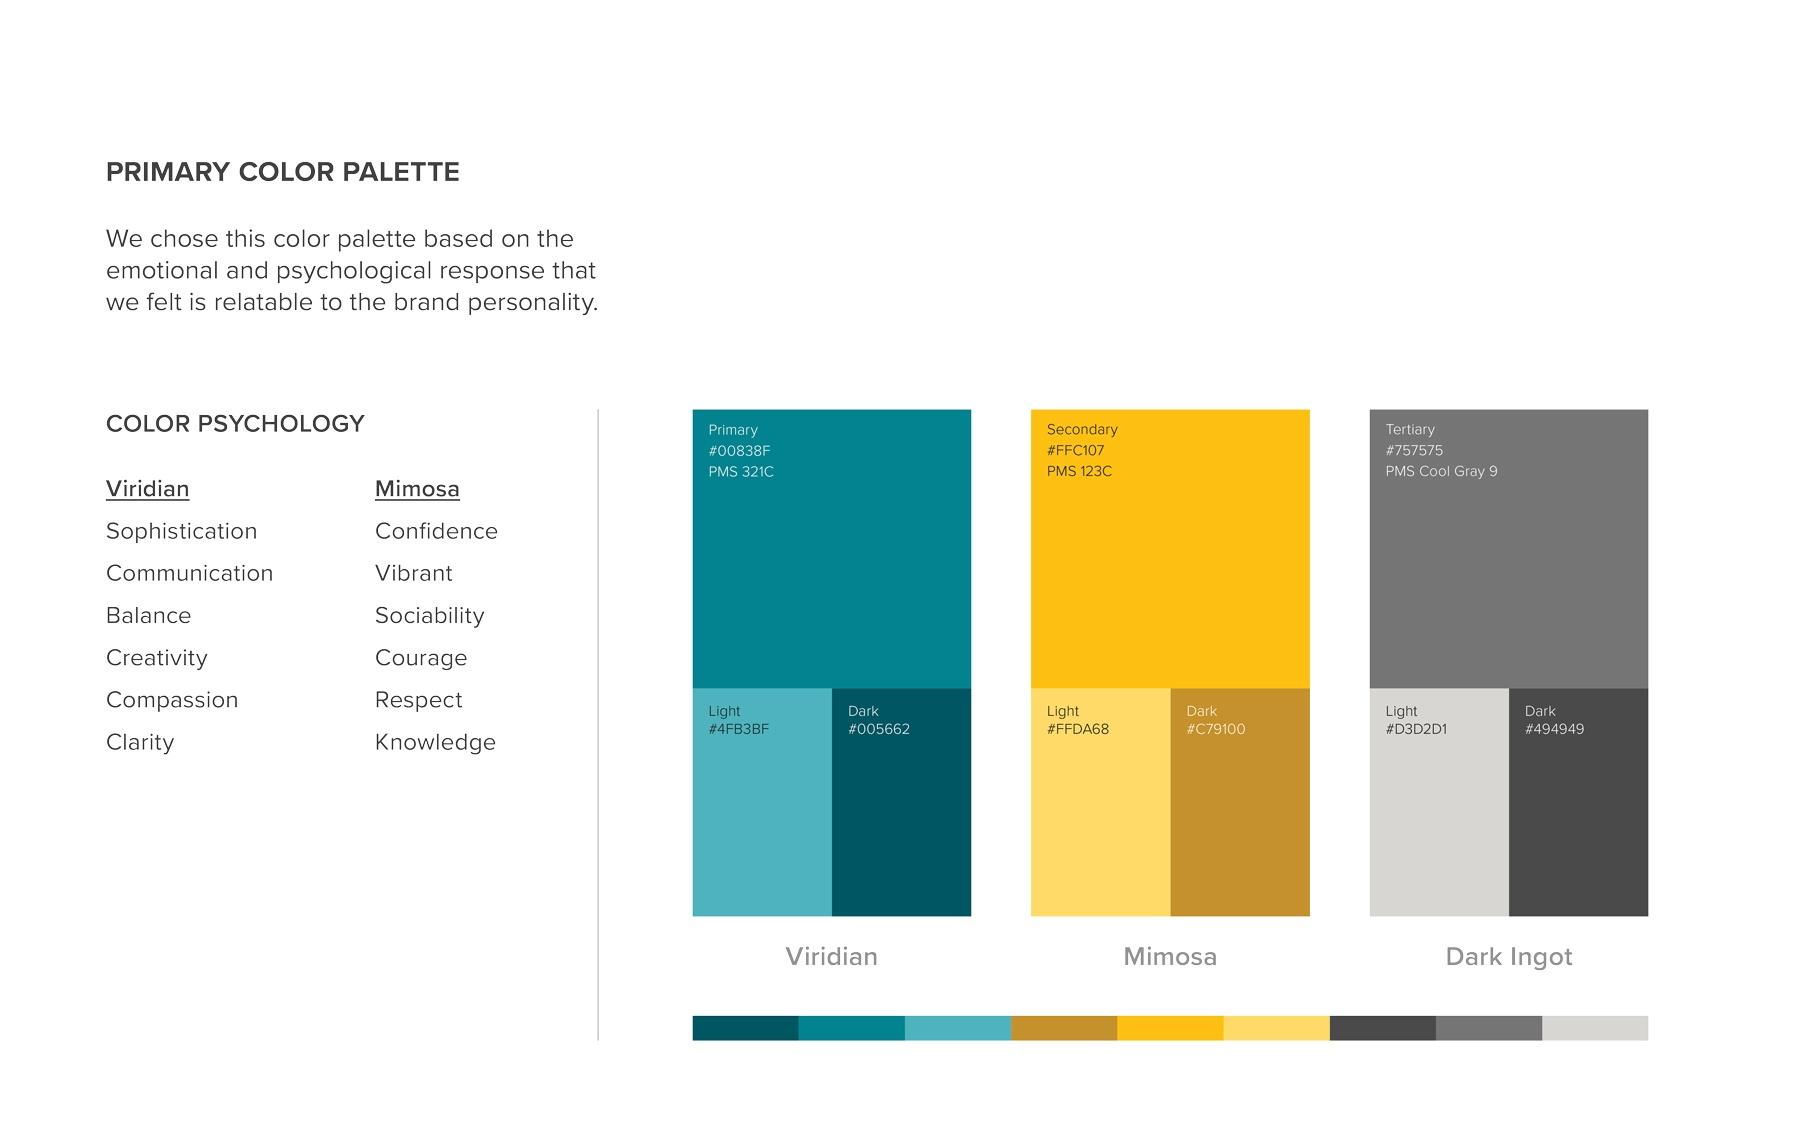 Primary color palette